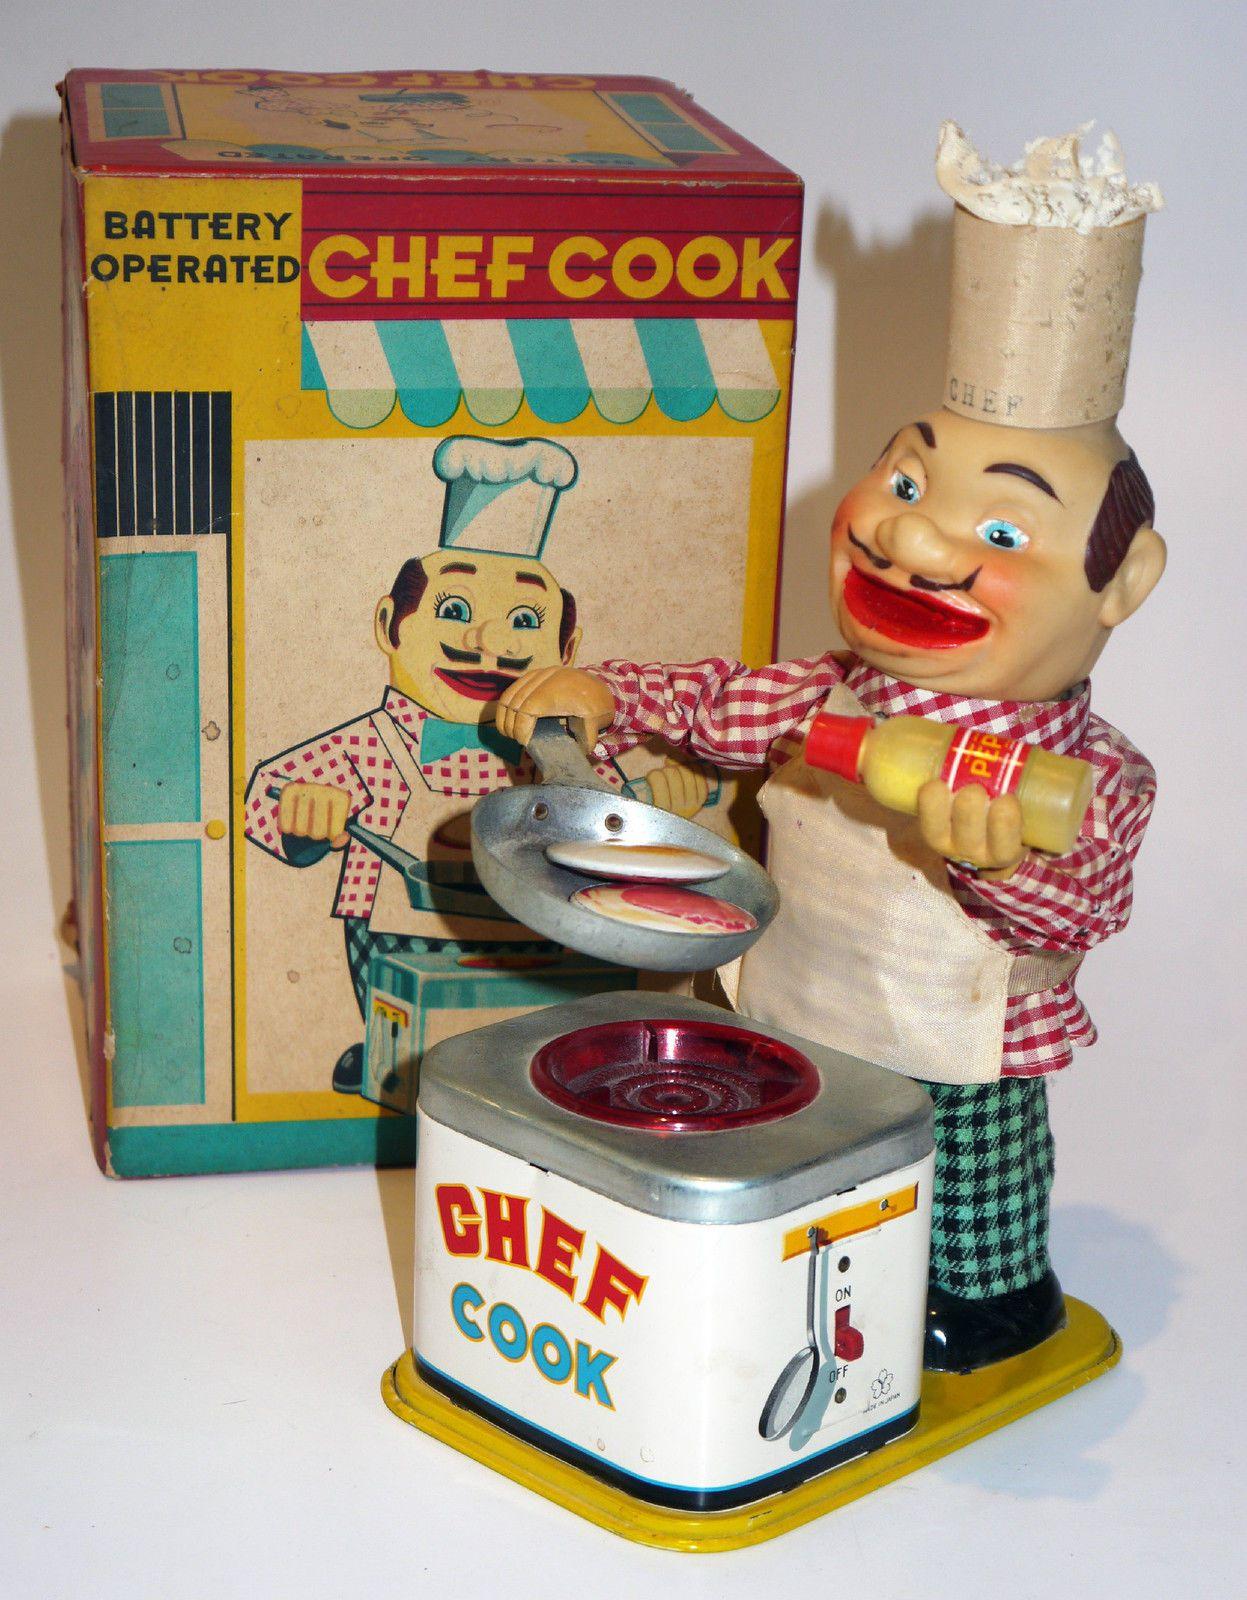 Yonezawa Chef Cook Batt Op toy from 60s ebay